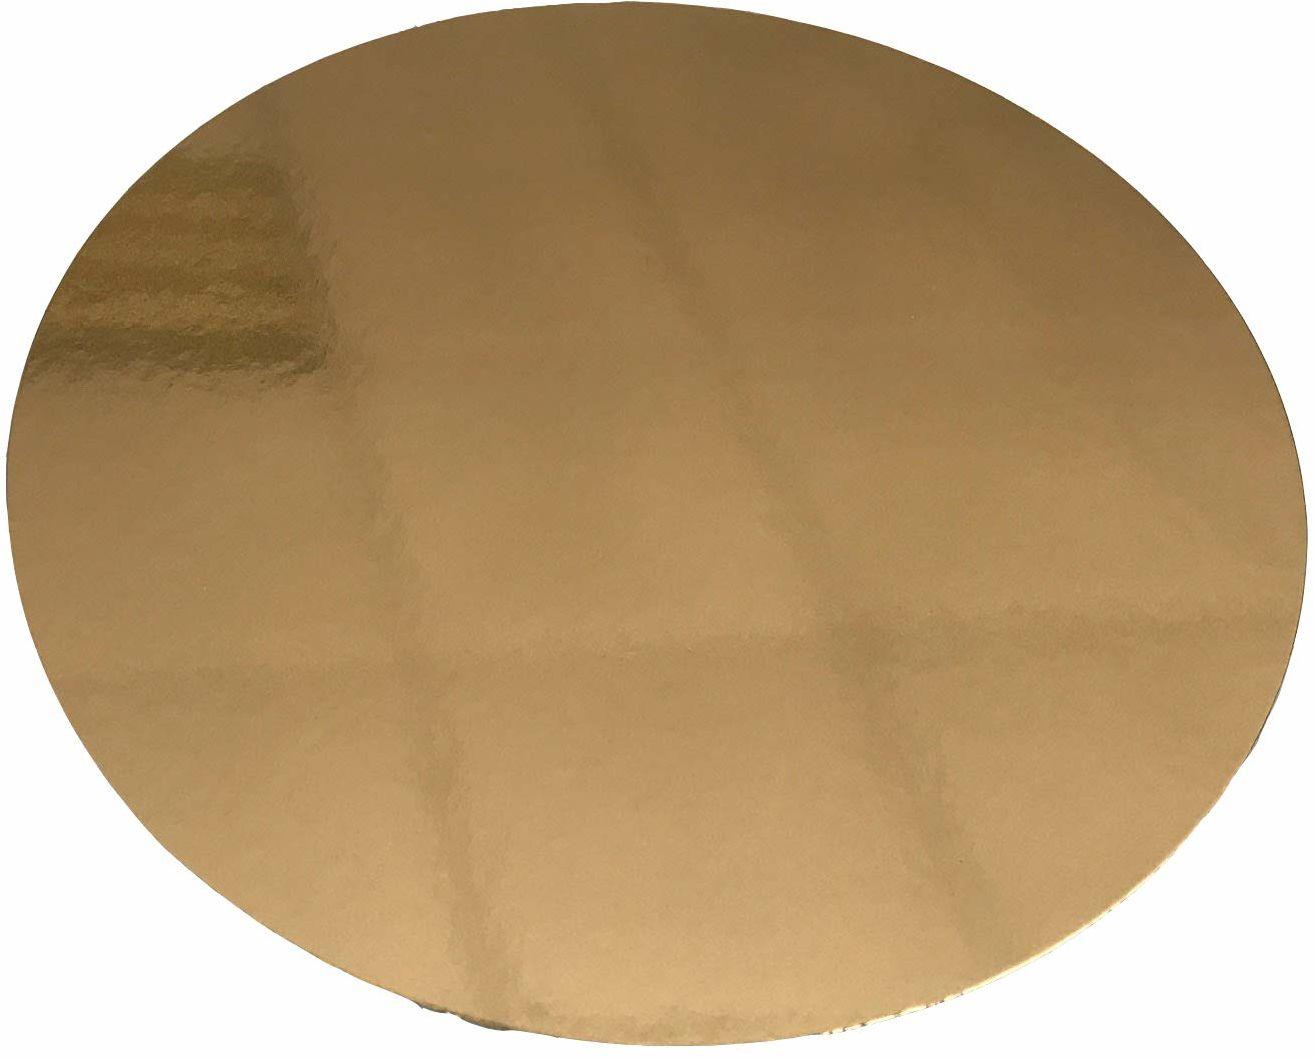 DeColorDulce SG2263 patera na ciasto, papier